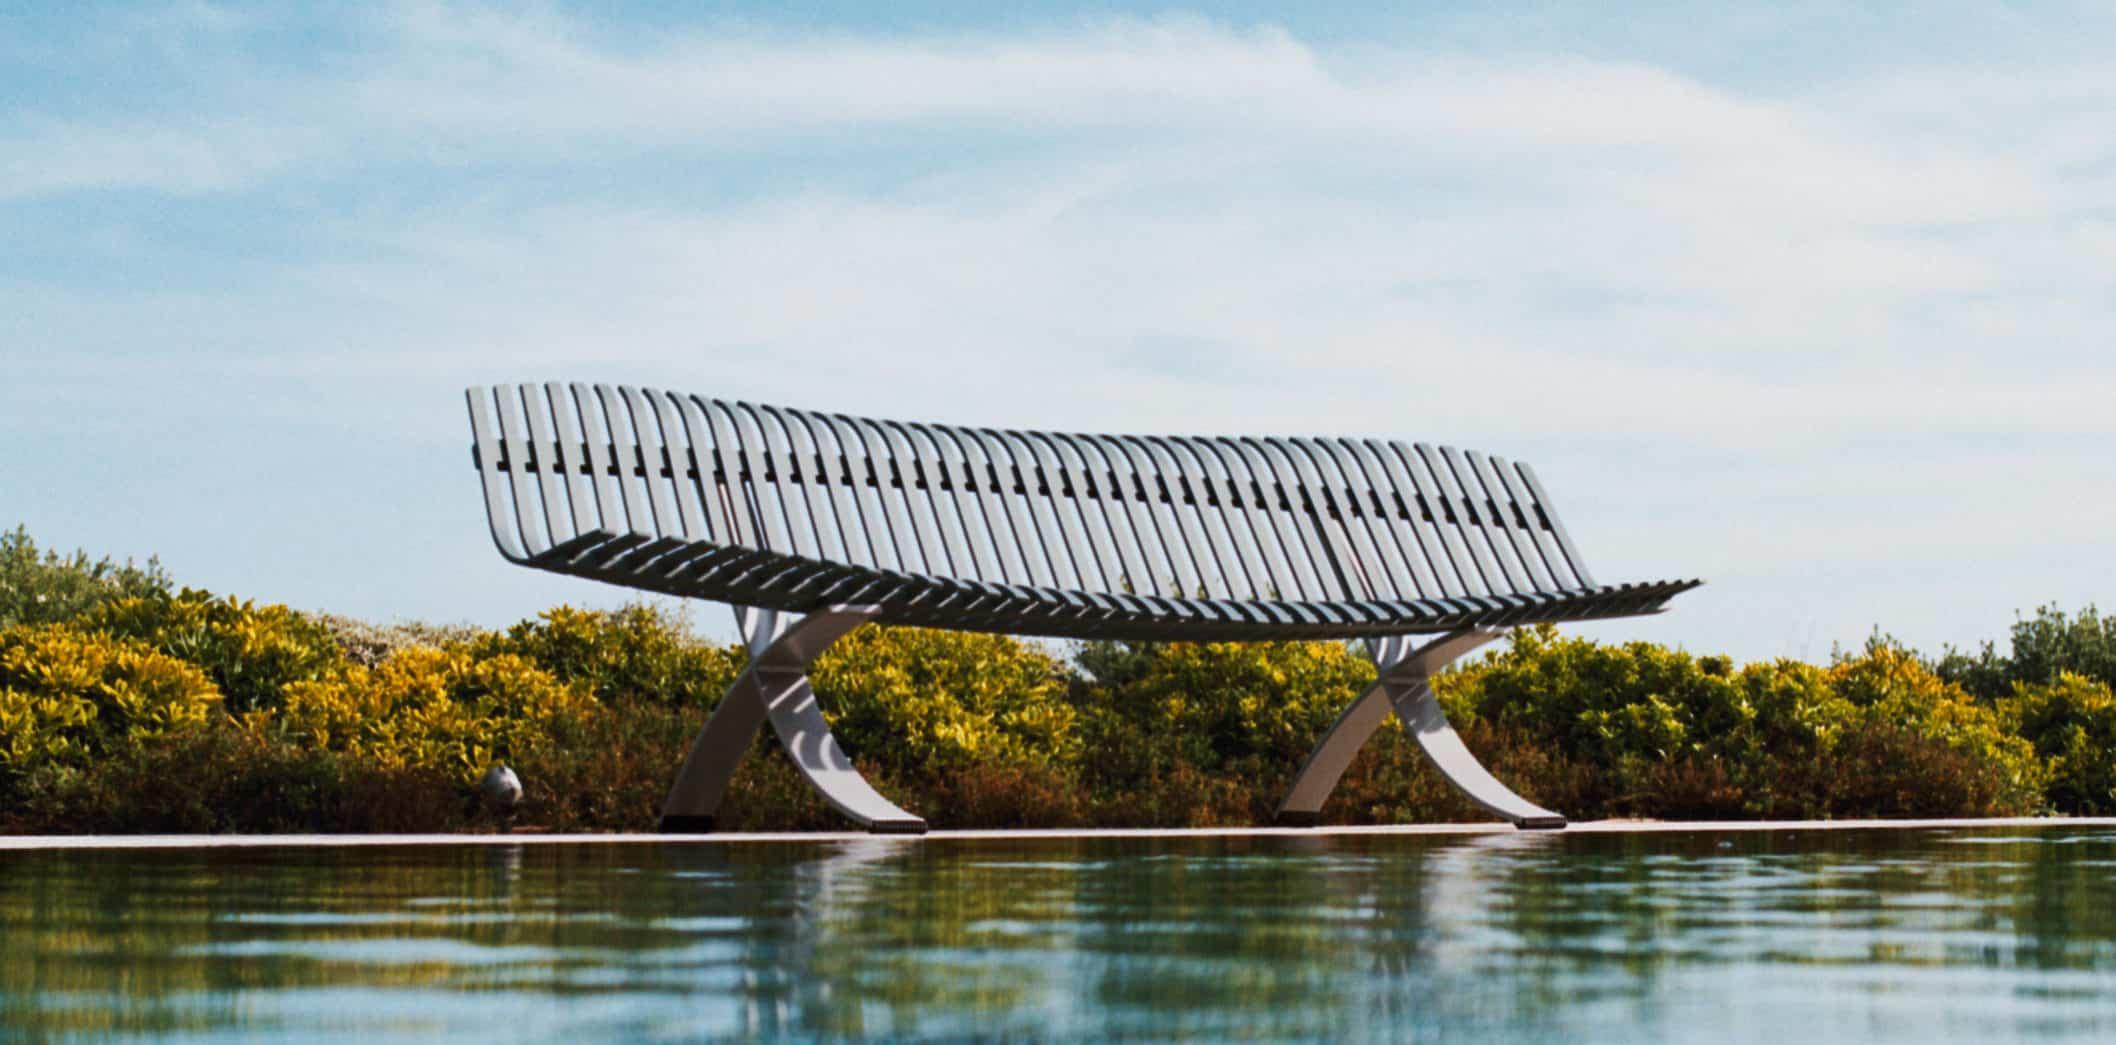 banc de jardin métallique moderne